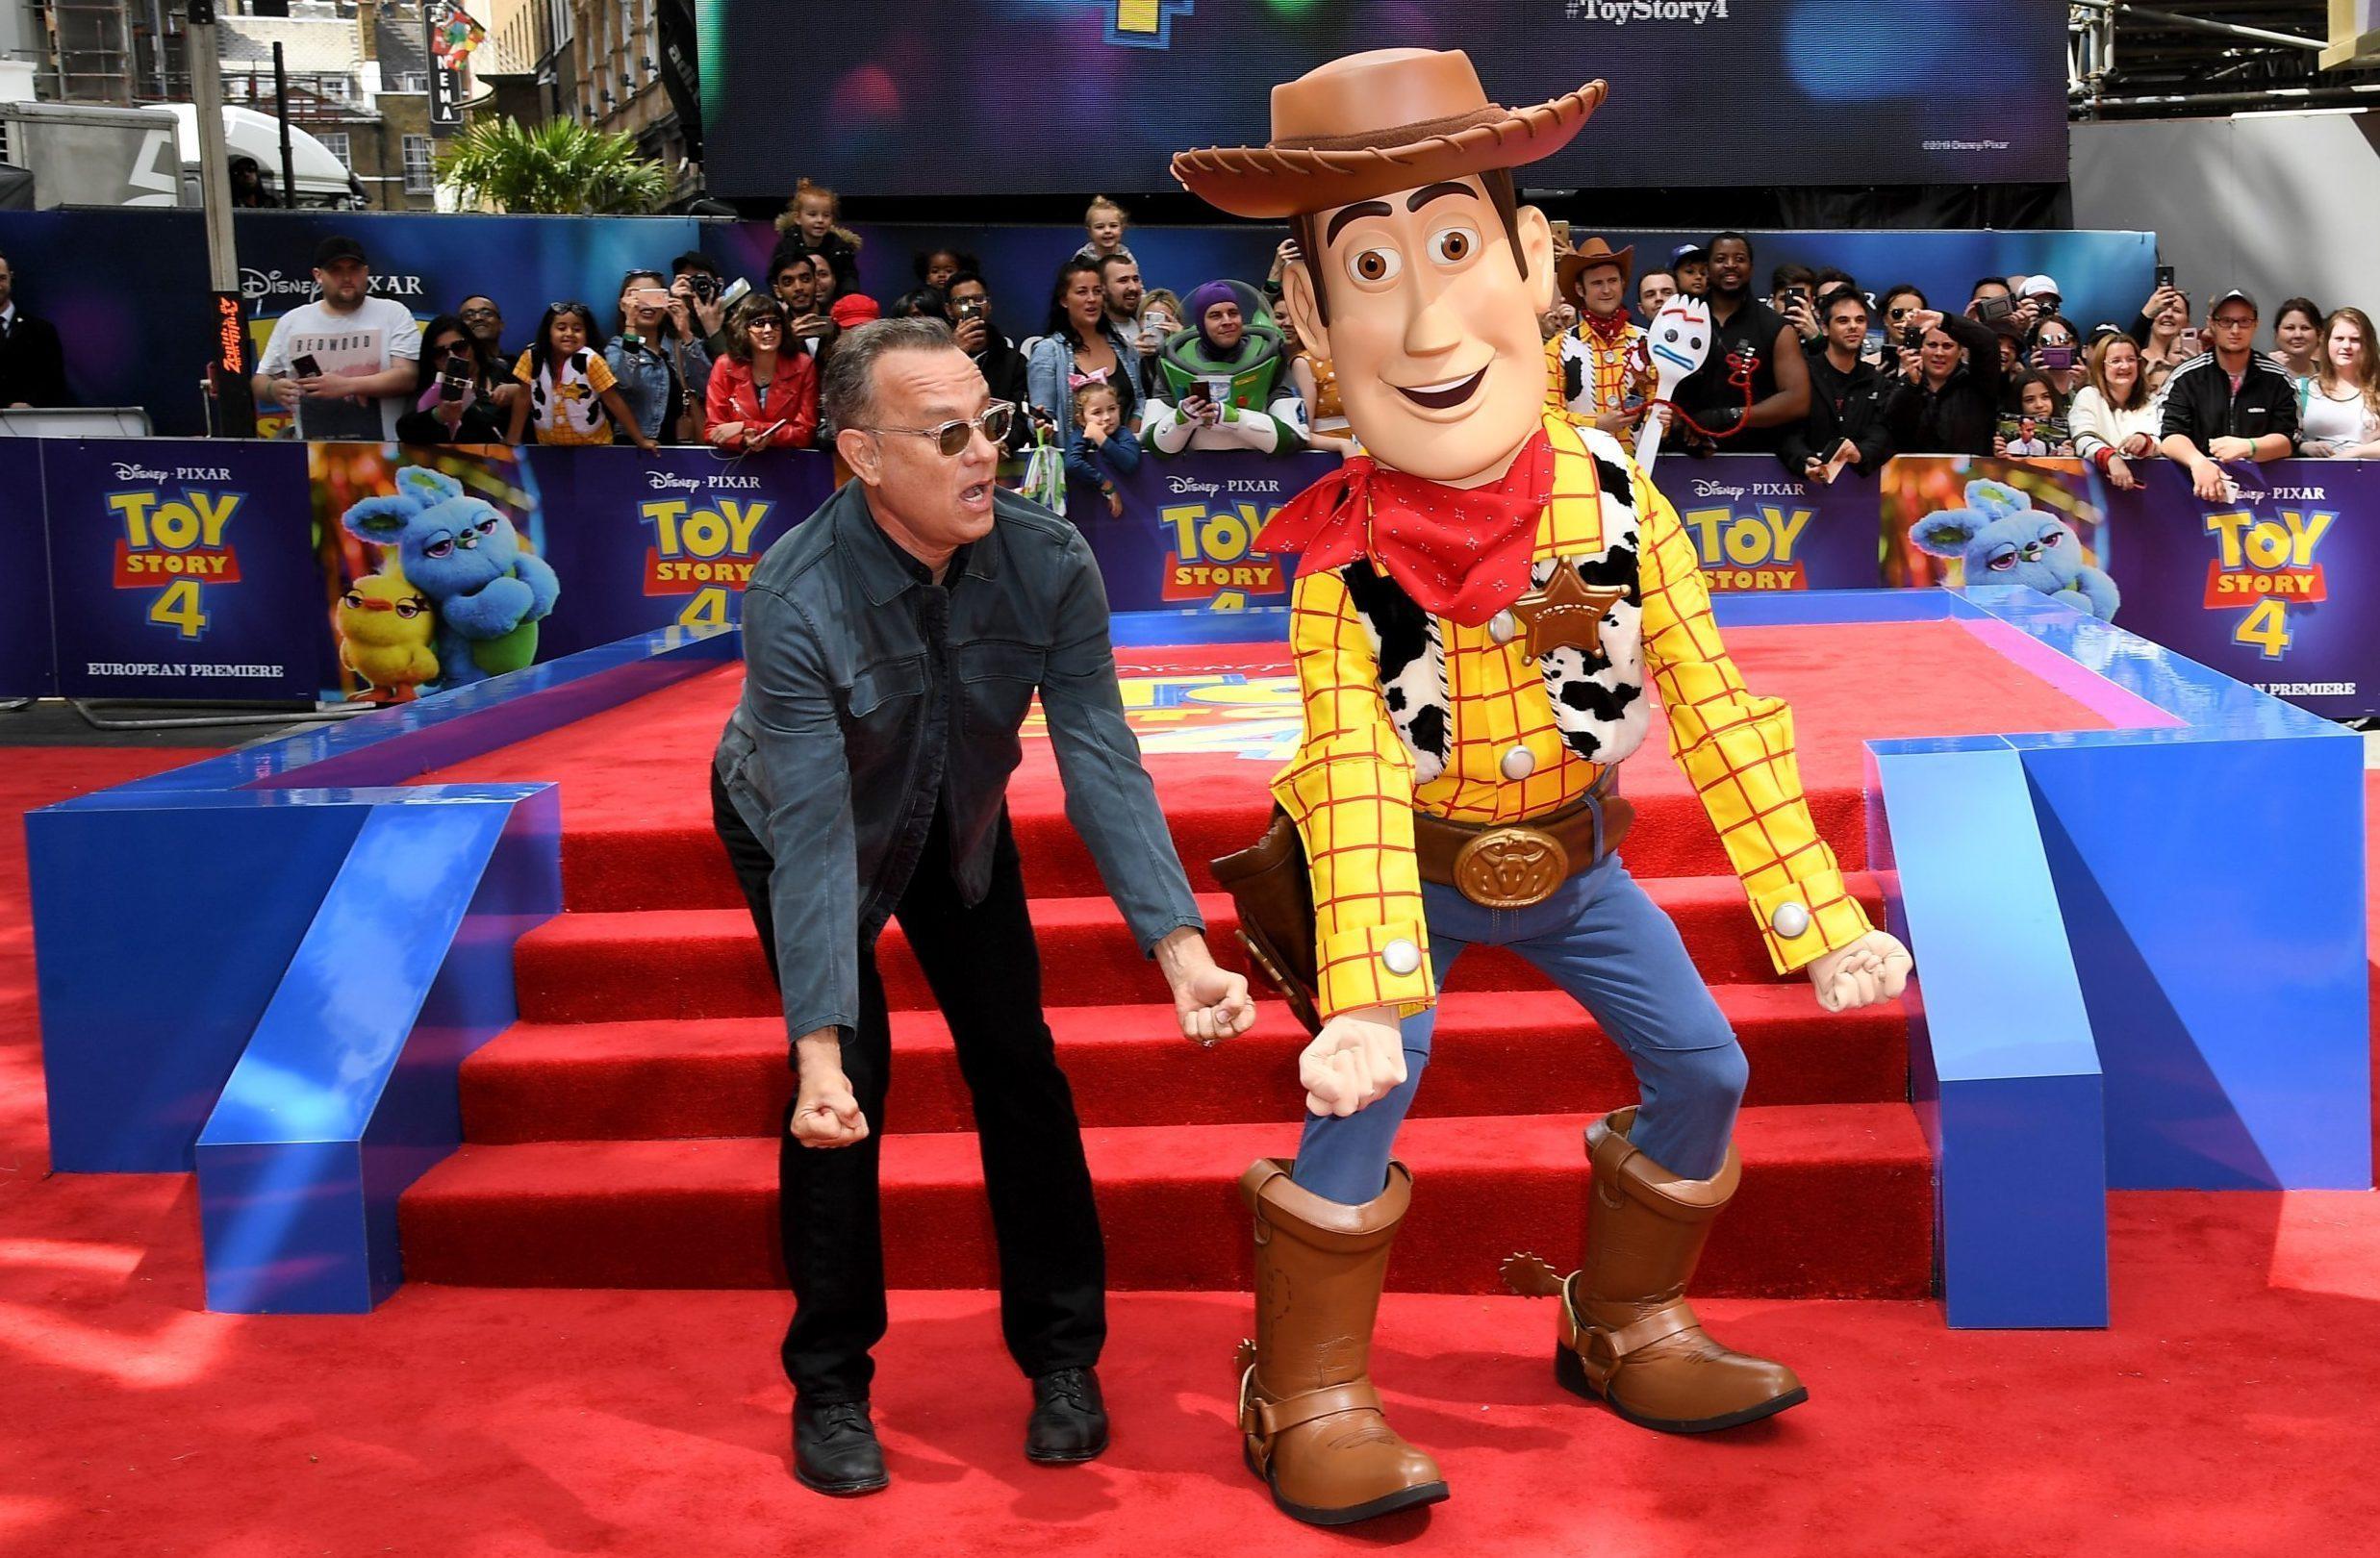 Tom Hanks 'Toy Story 4' film premiere, London, UK